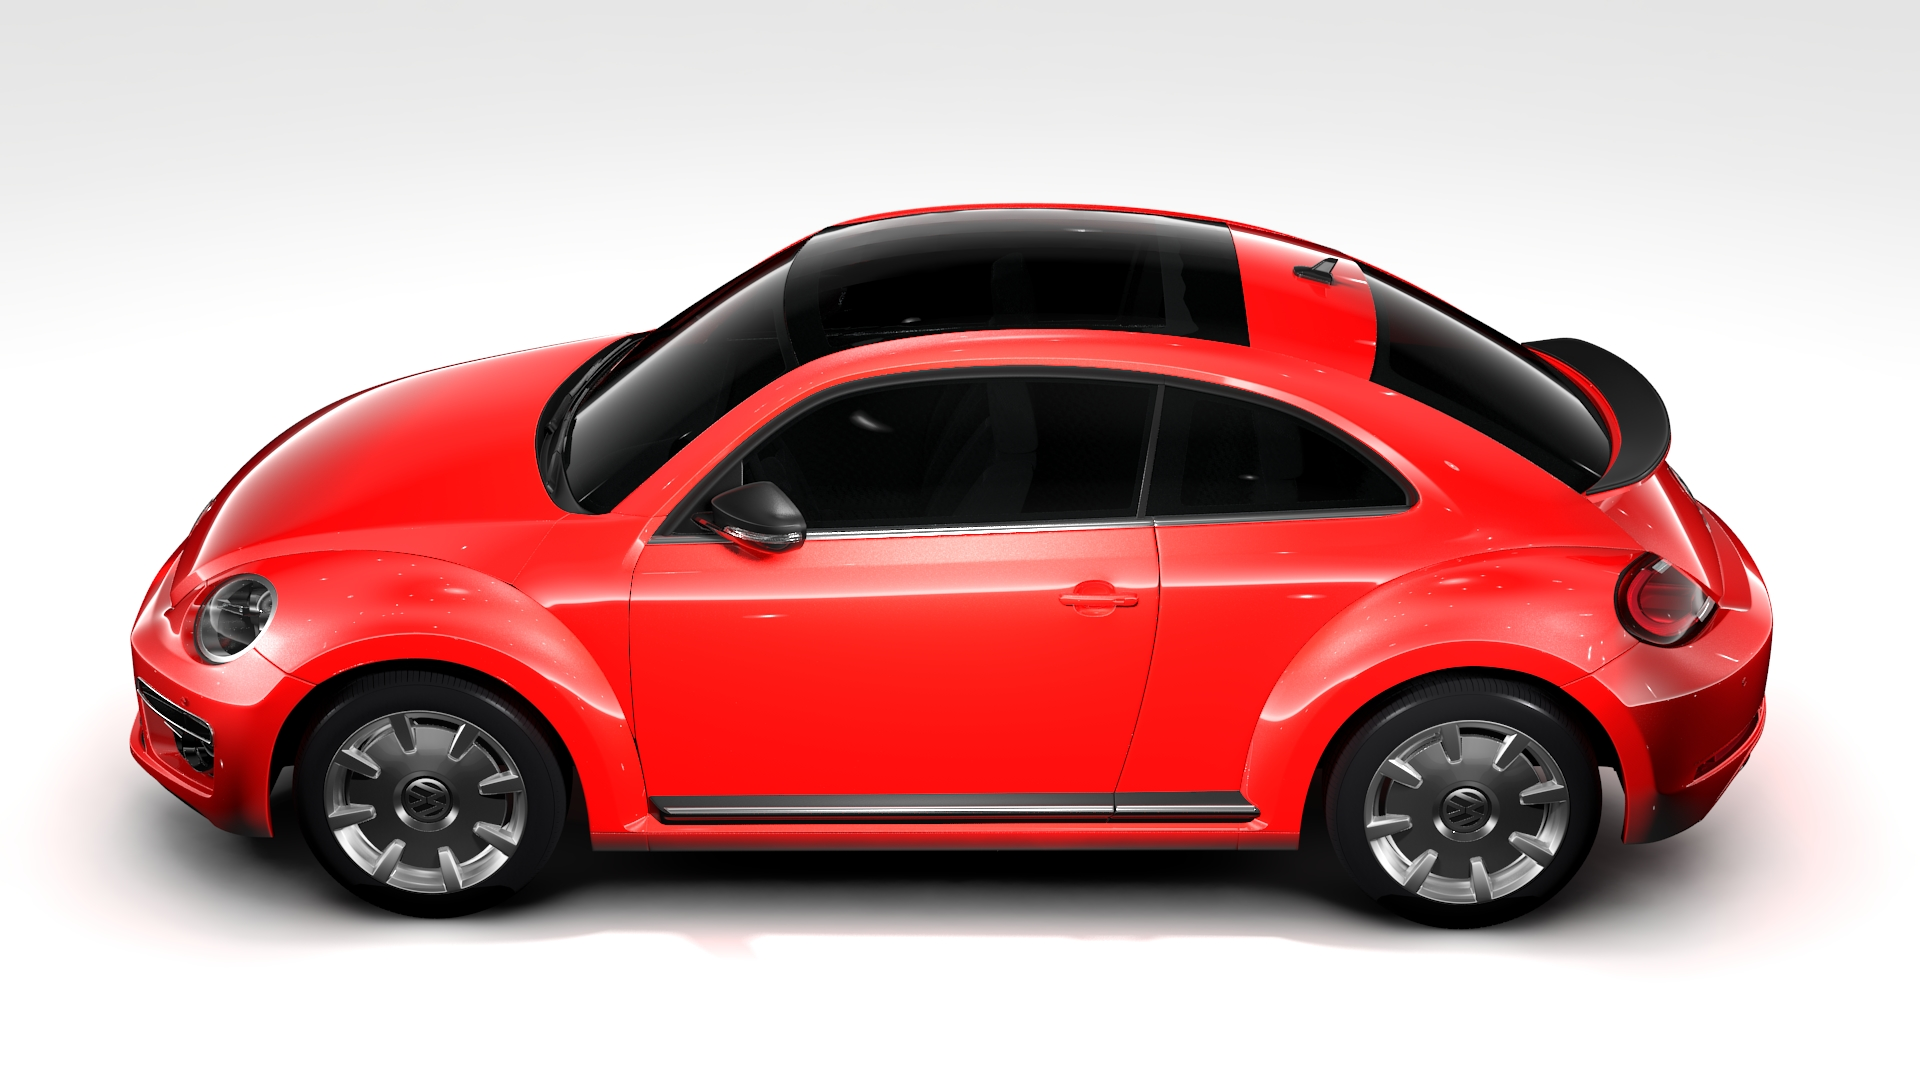 vw beetle turbo 2017 3d model 3ds max fbx c4d lwo ma mb hrc xsi obj 221666